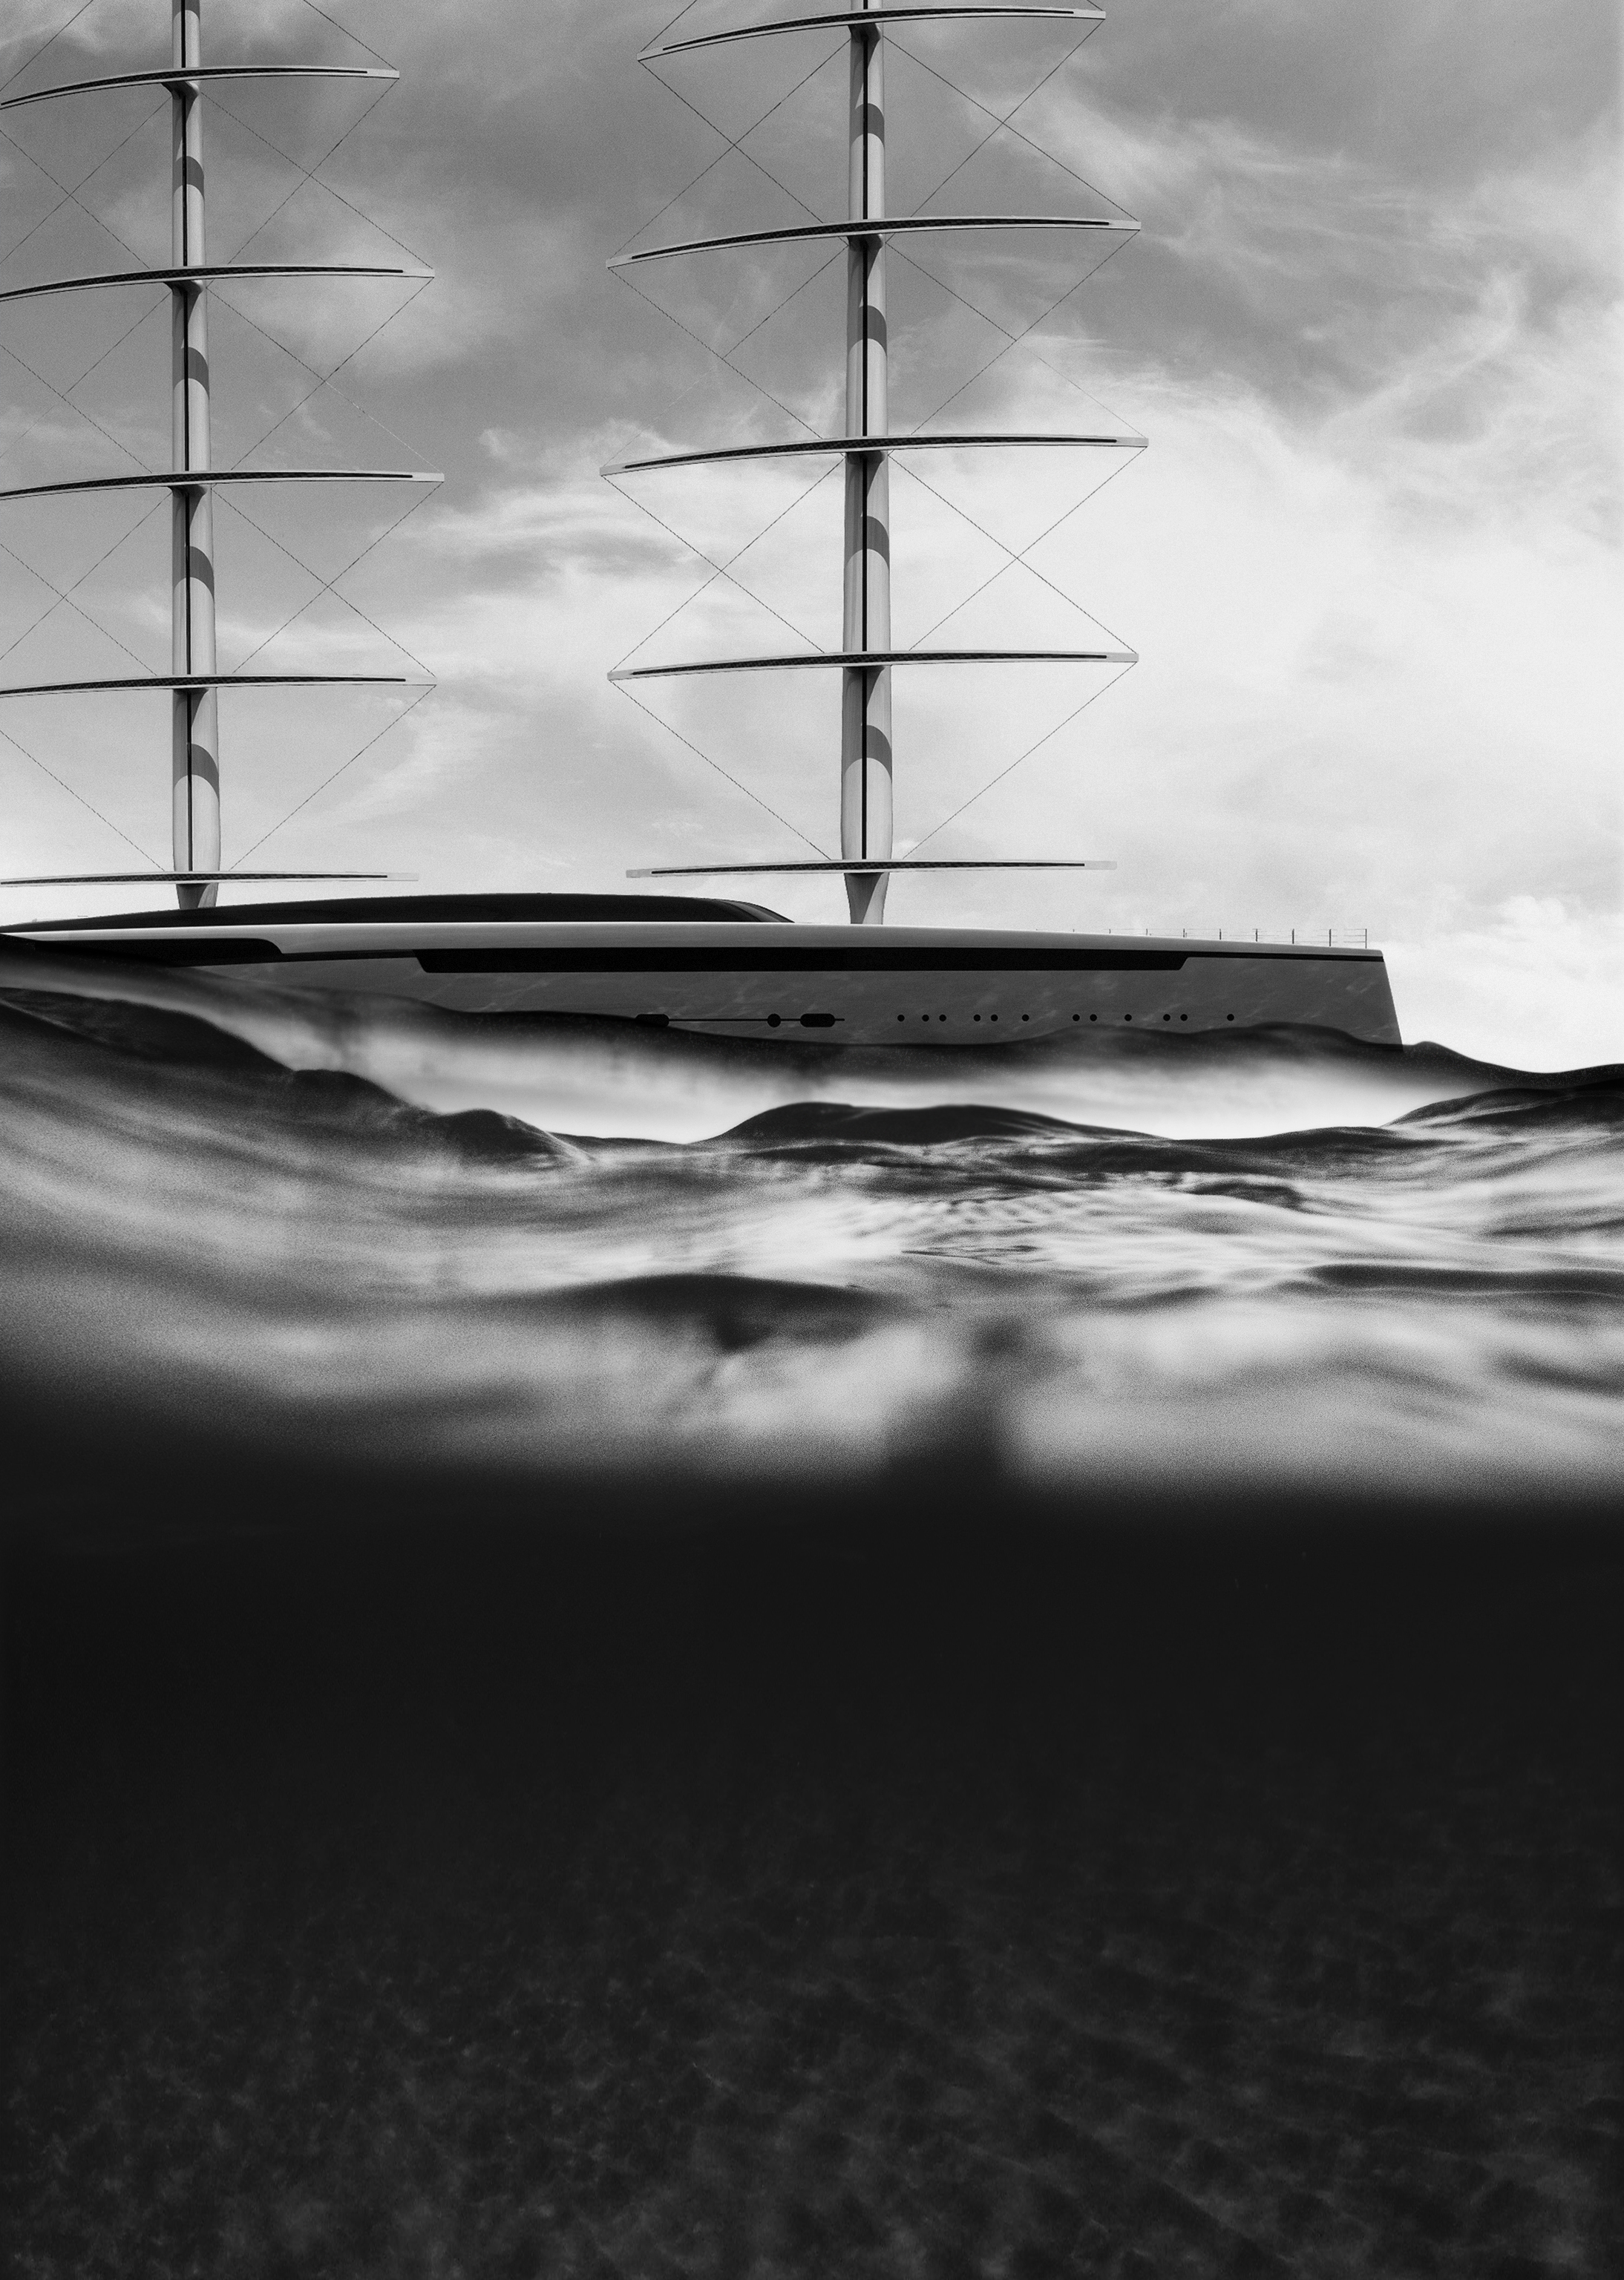 World Premiere Monaco Yacht Show